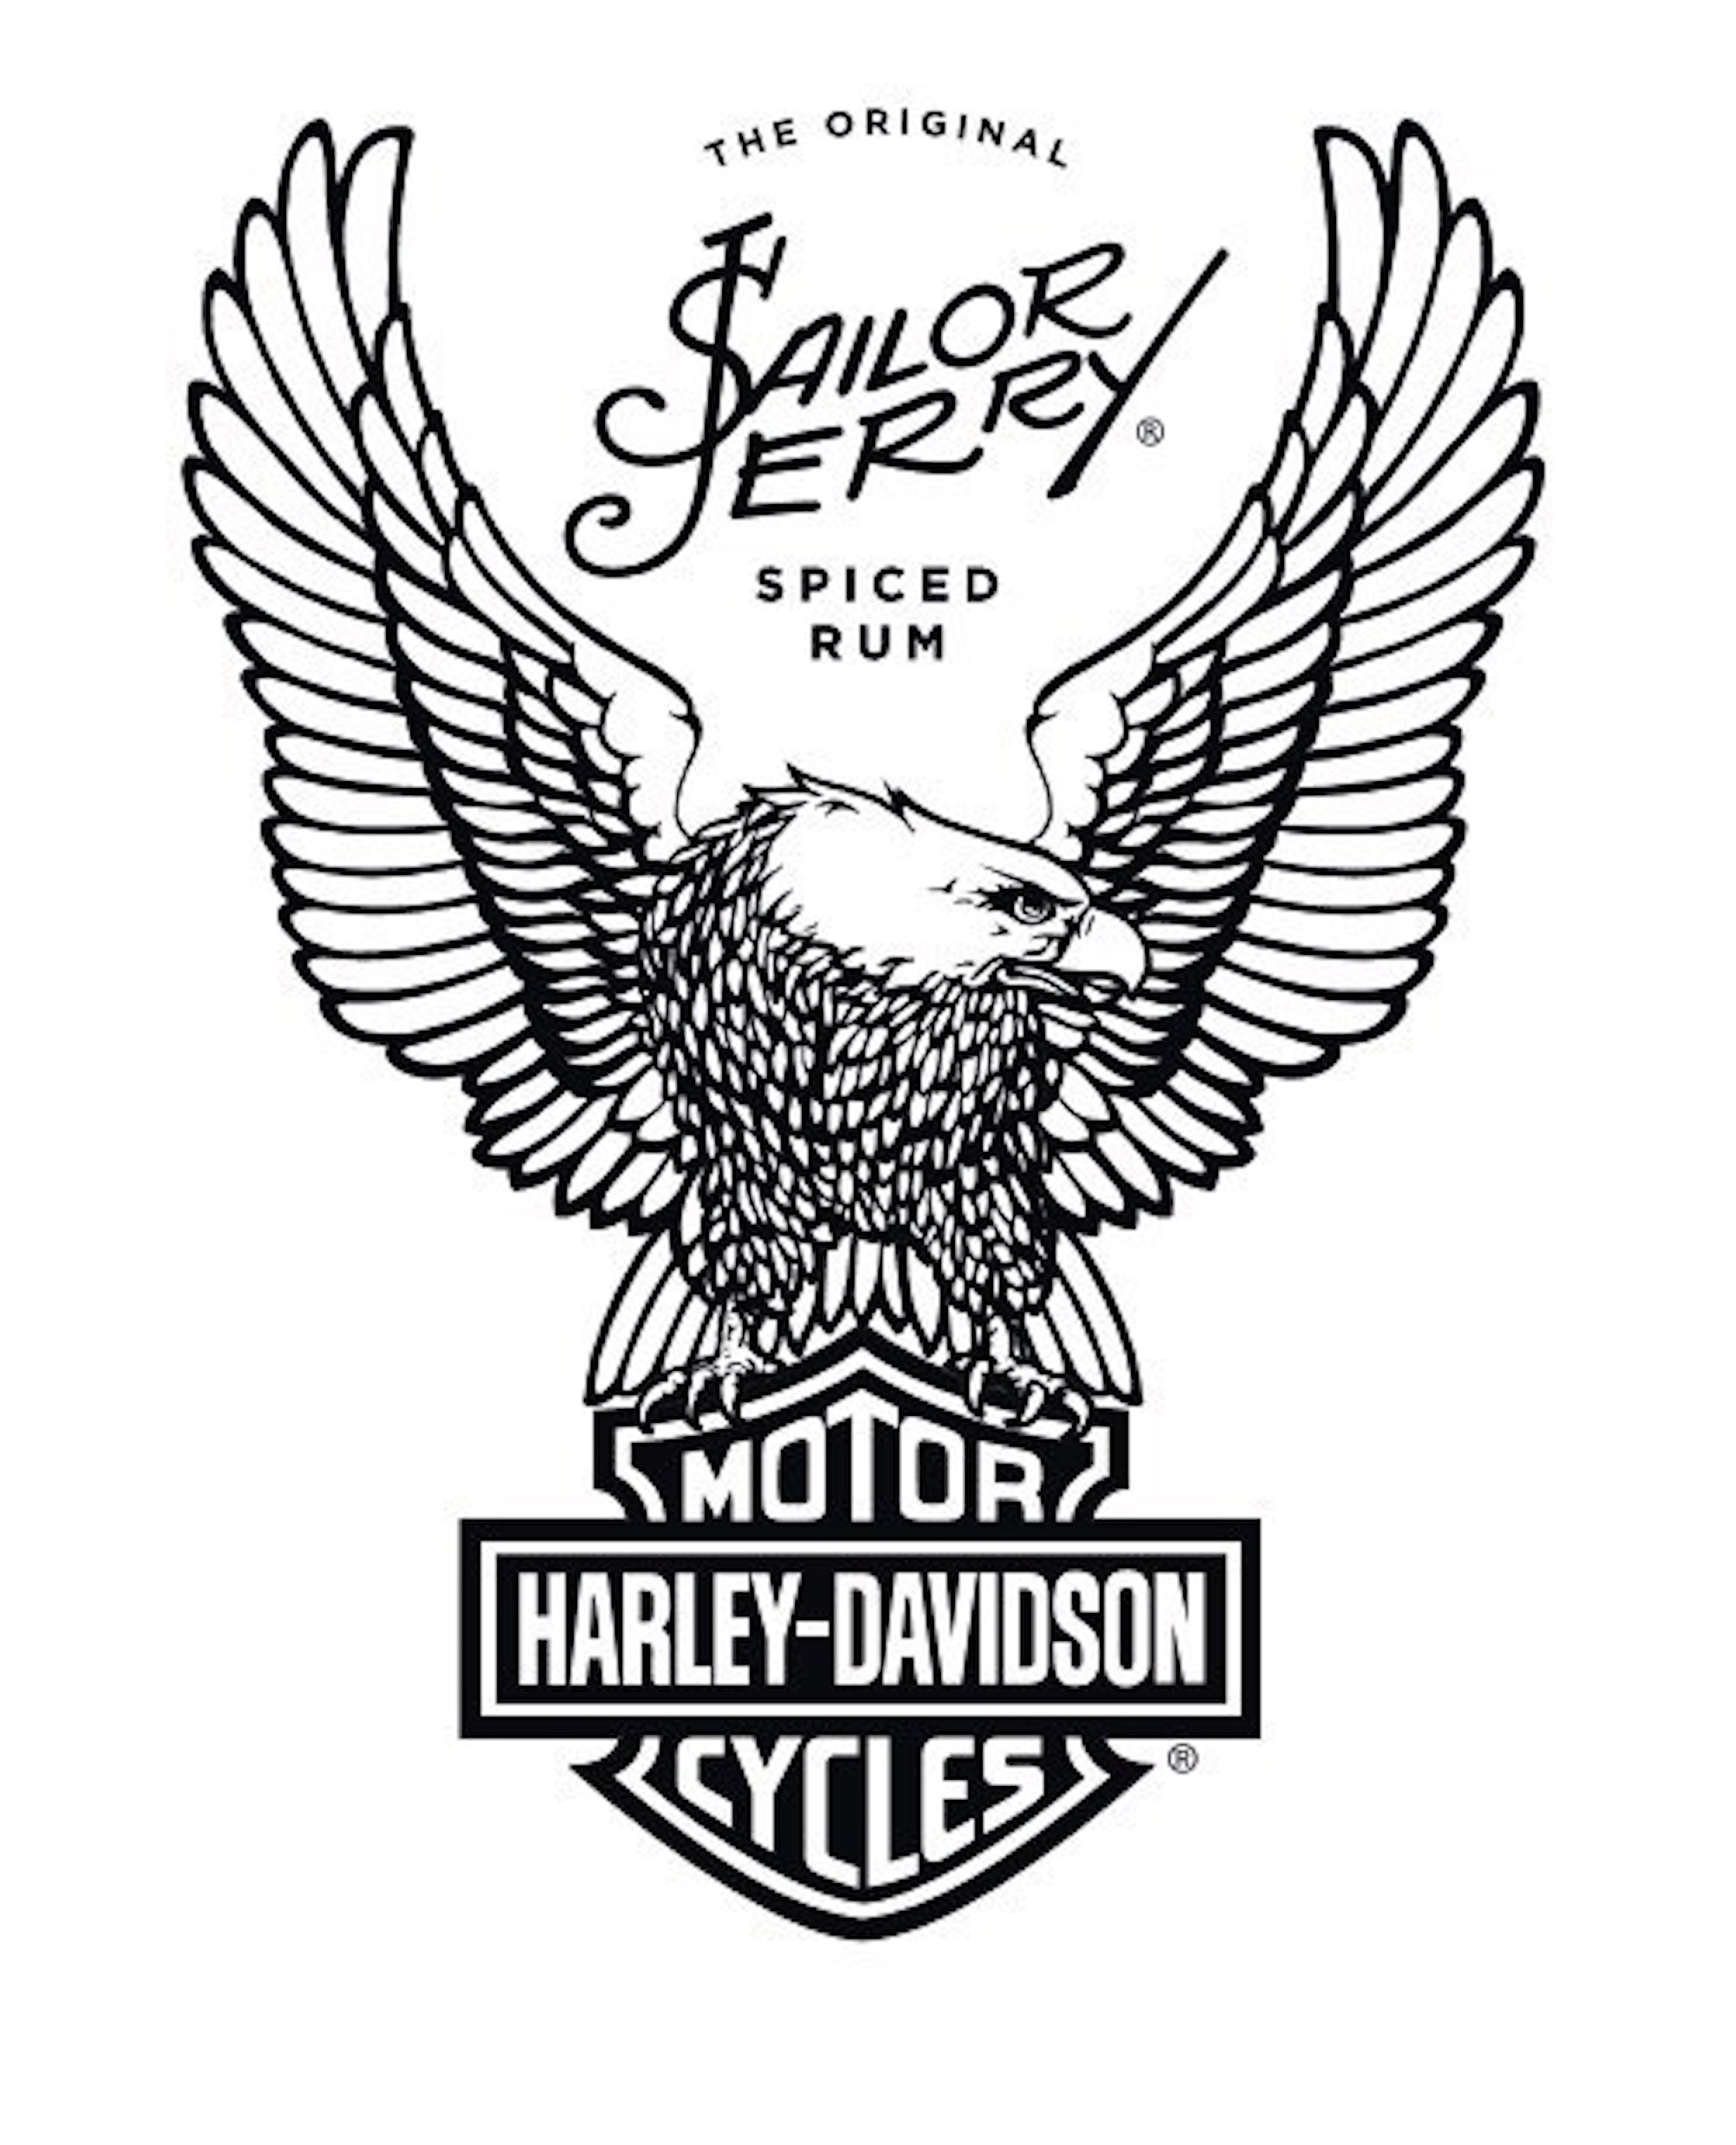 sailor jerry spiced rum harley-davidson logo